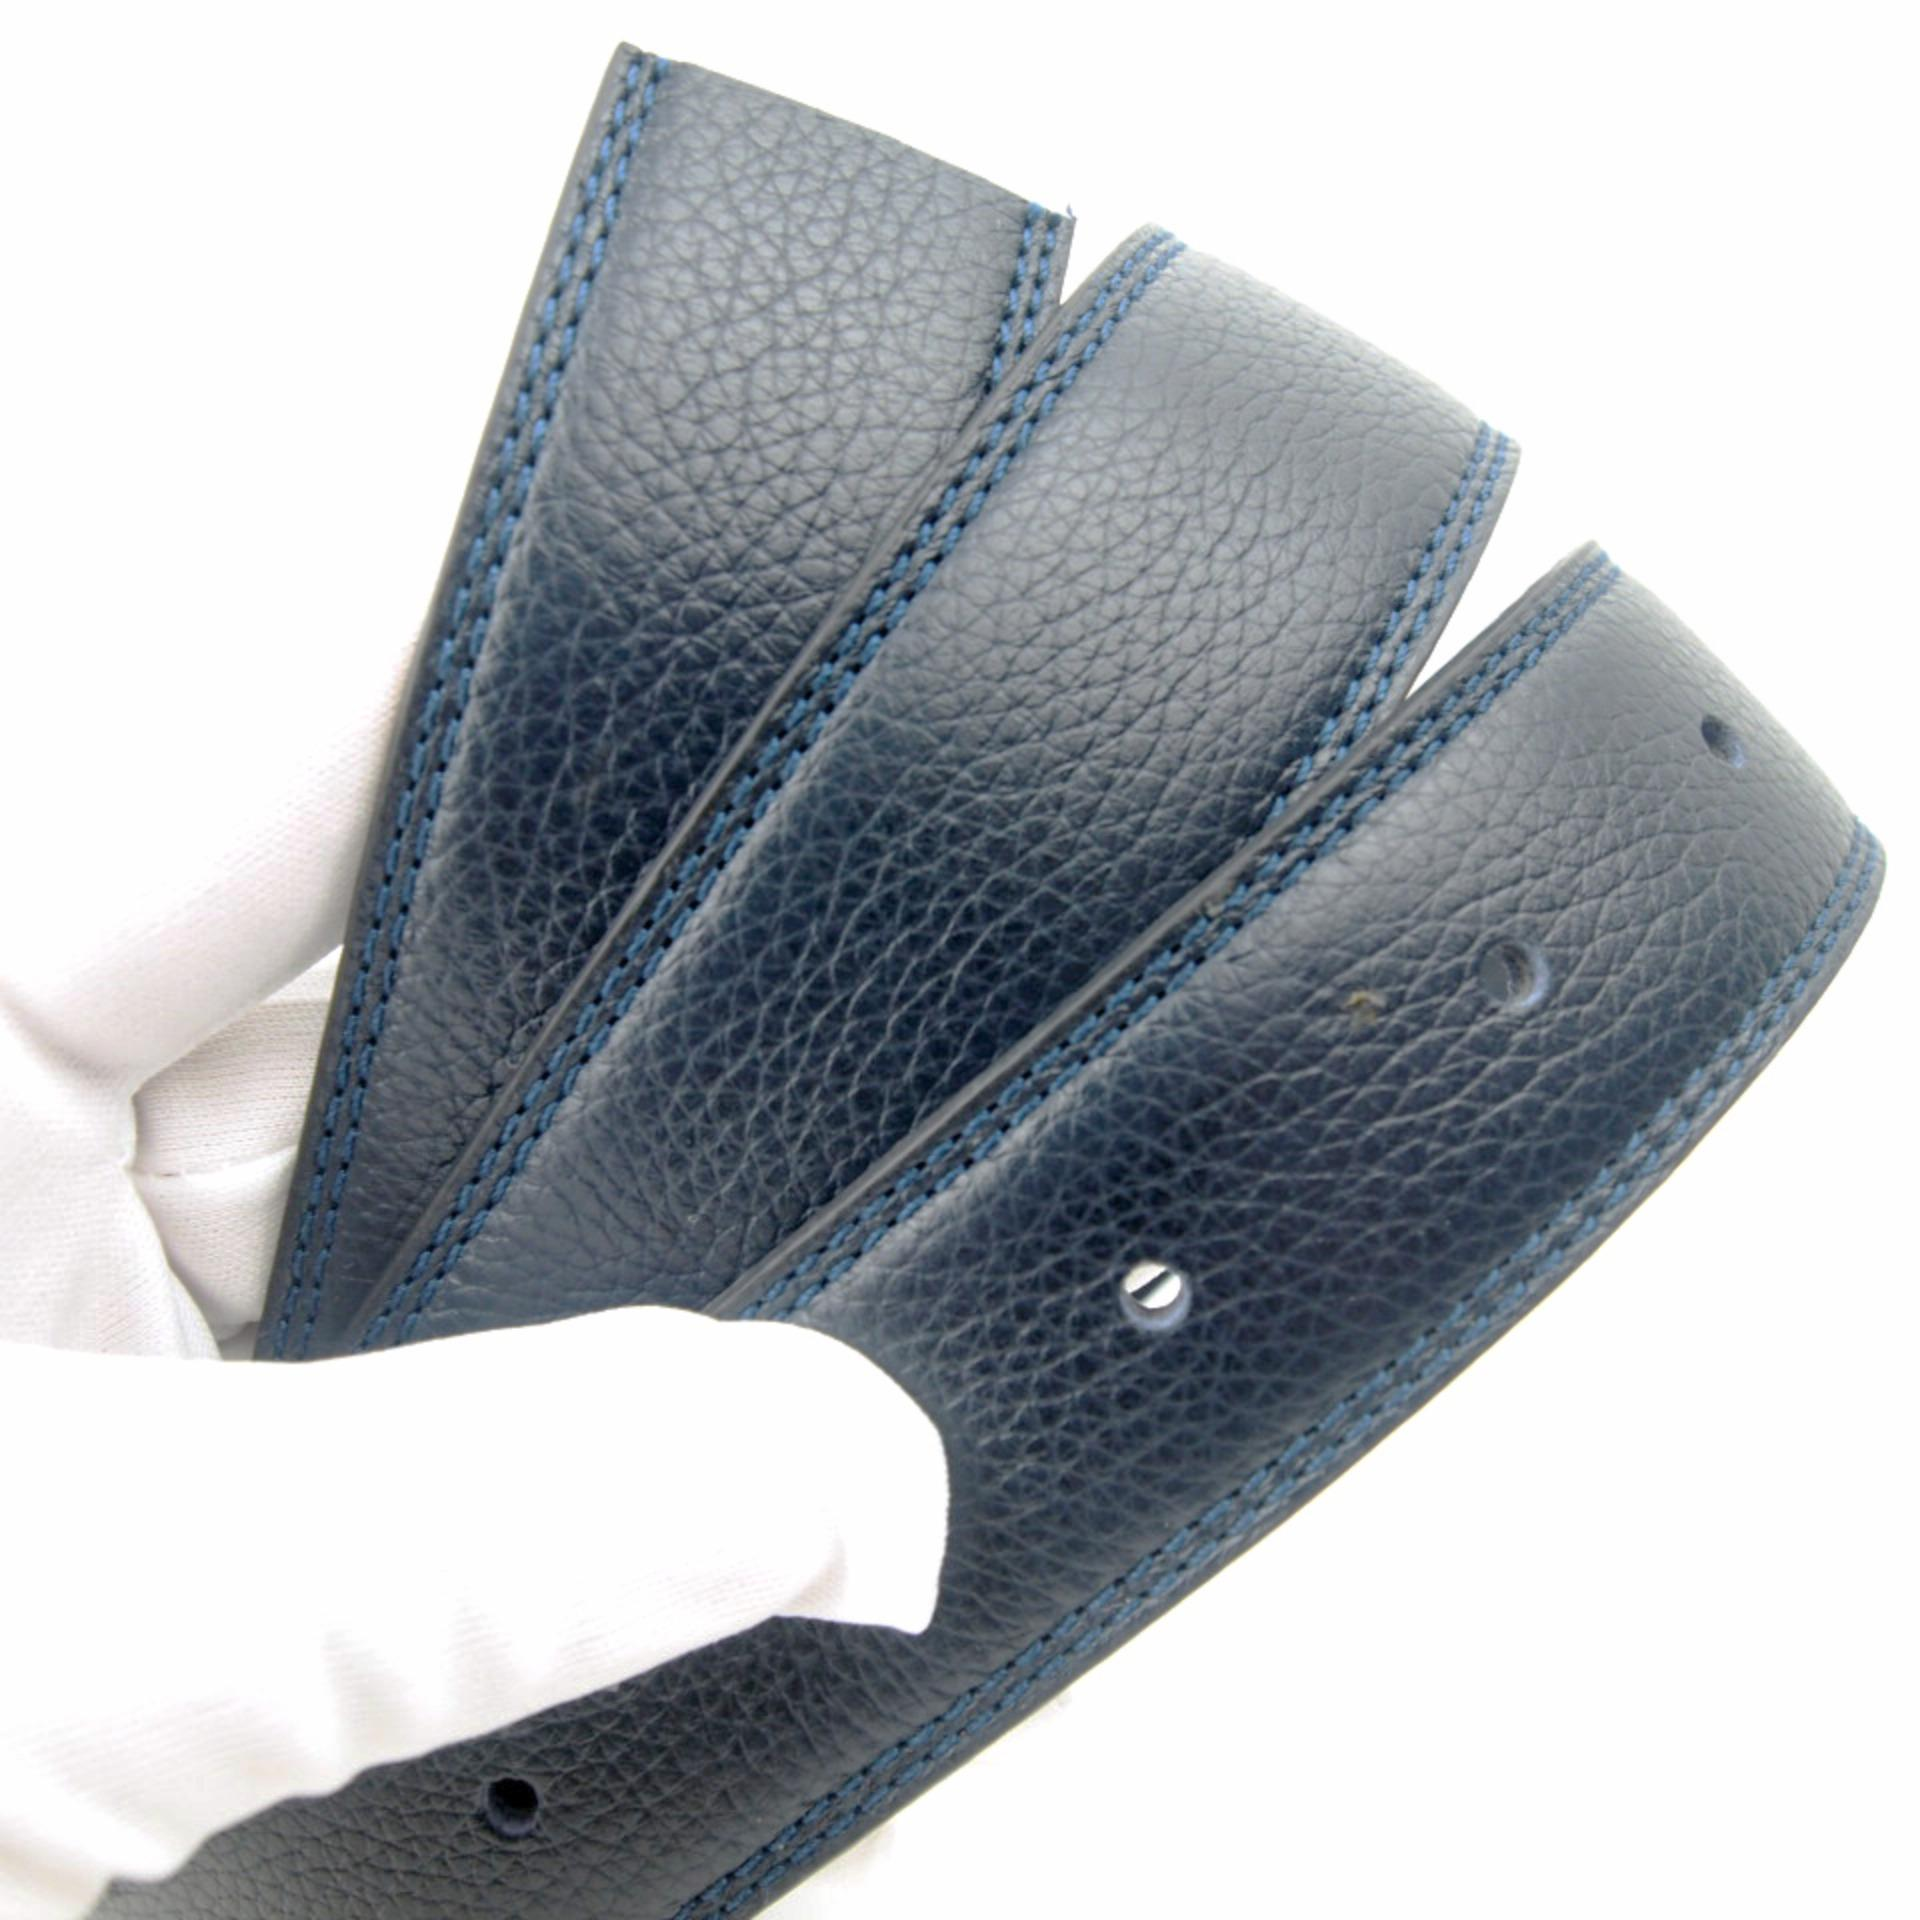 Gesper Genuine Leather Tali Pinggang Kulit Asli Tipe Lubang Tanpa Kepala Ukuran Lebar